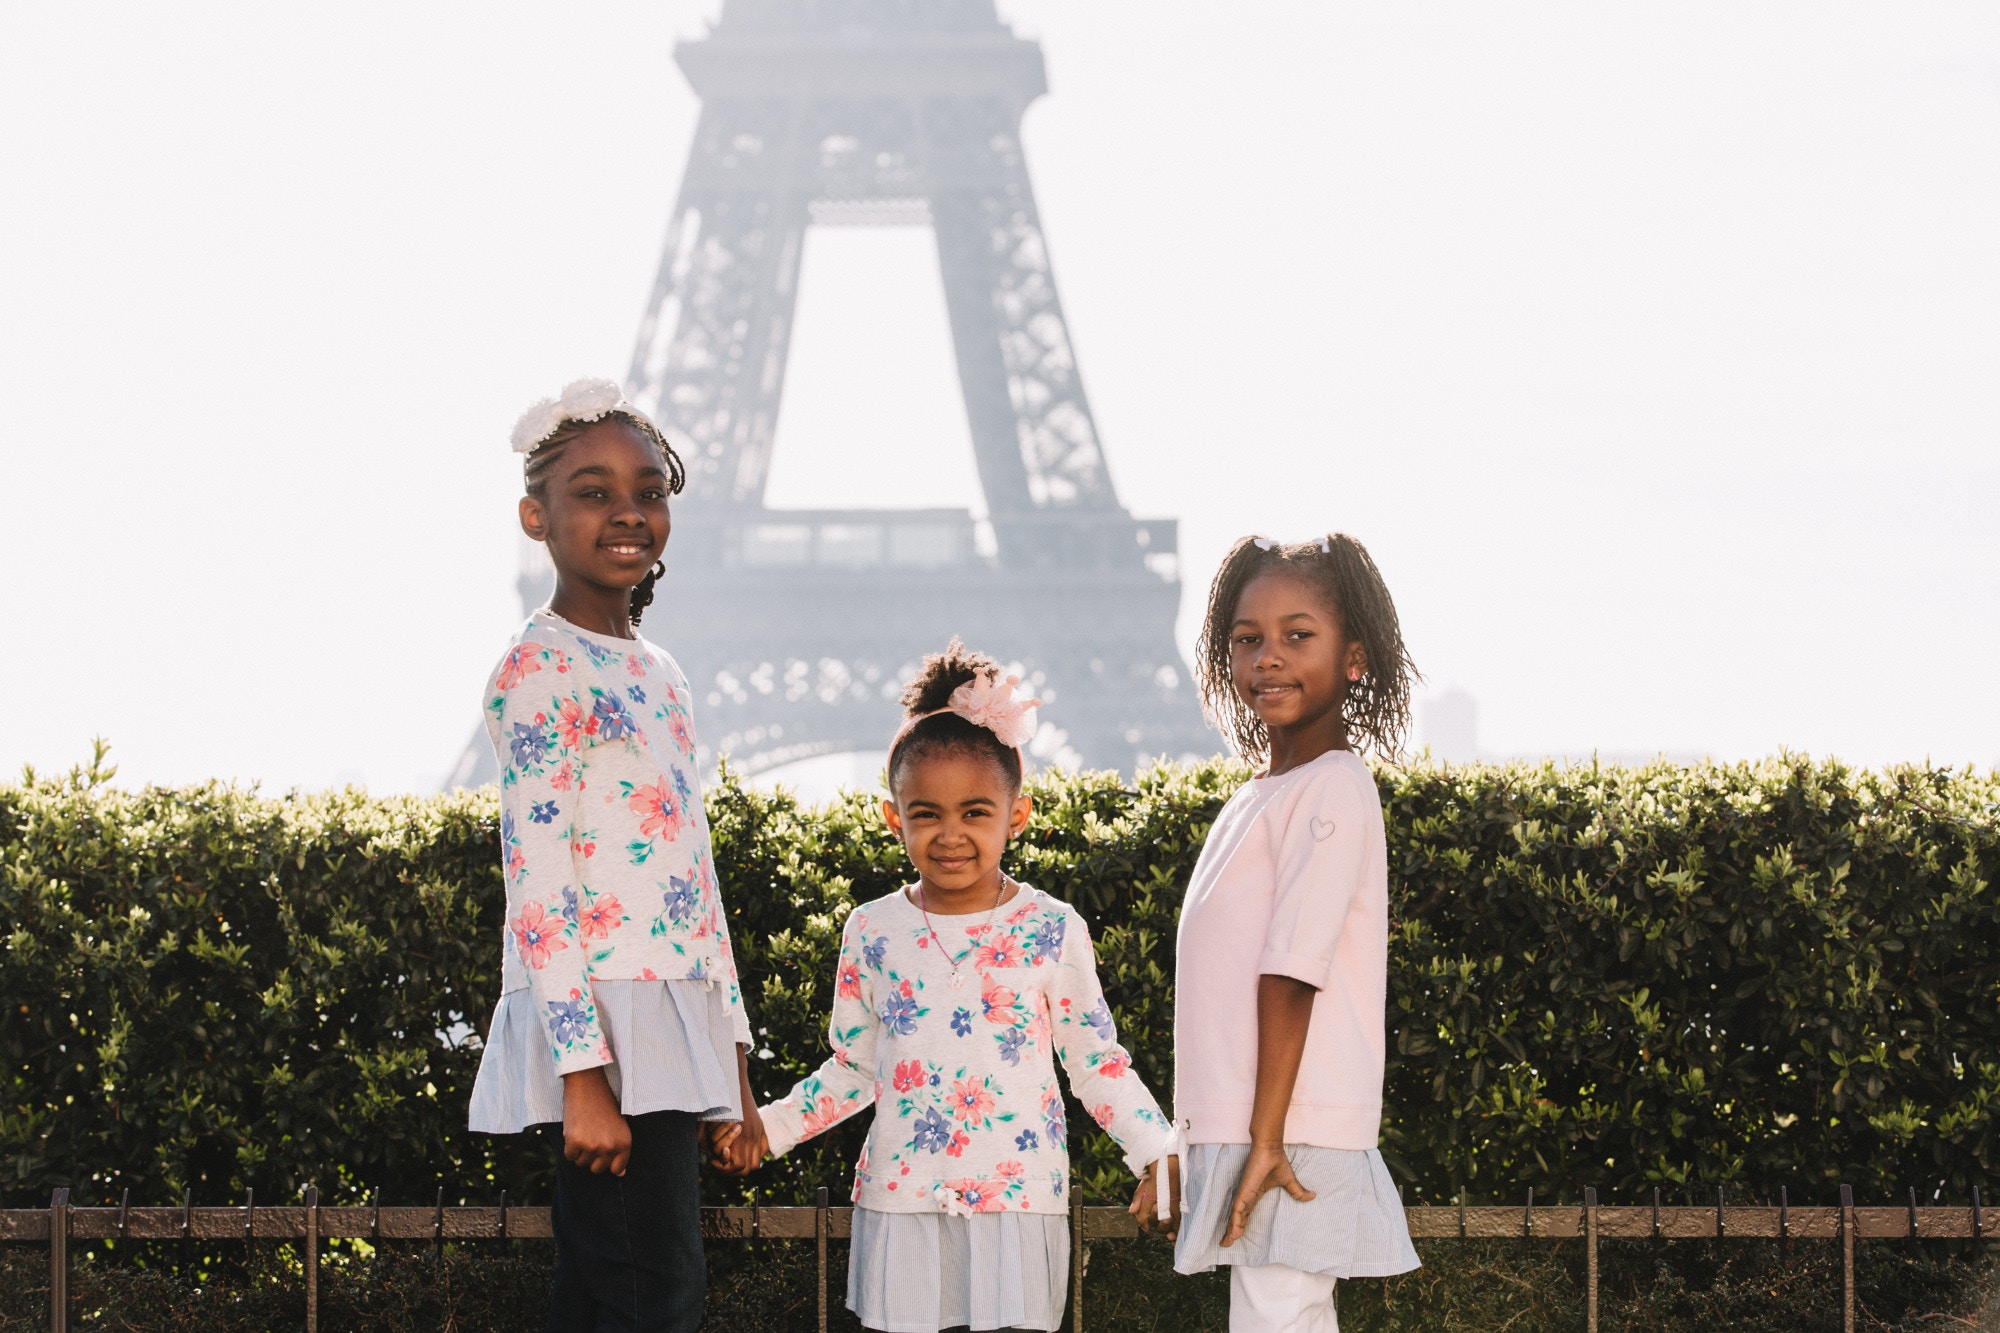 The Spring Break Family's three children in front of the Eiffel Tower, Paris, France © the Spring Break Family